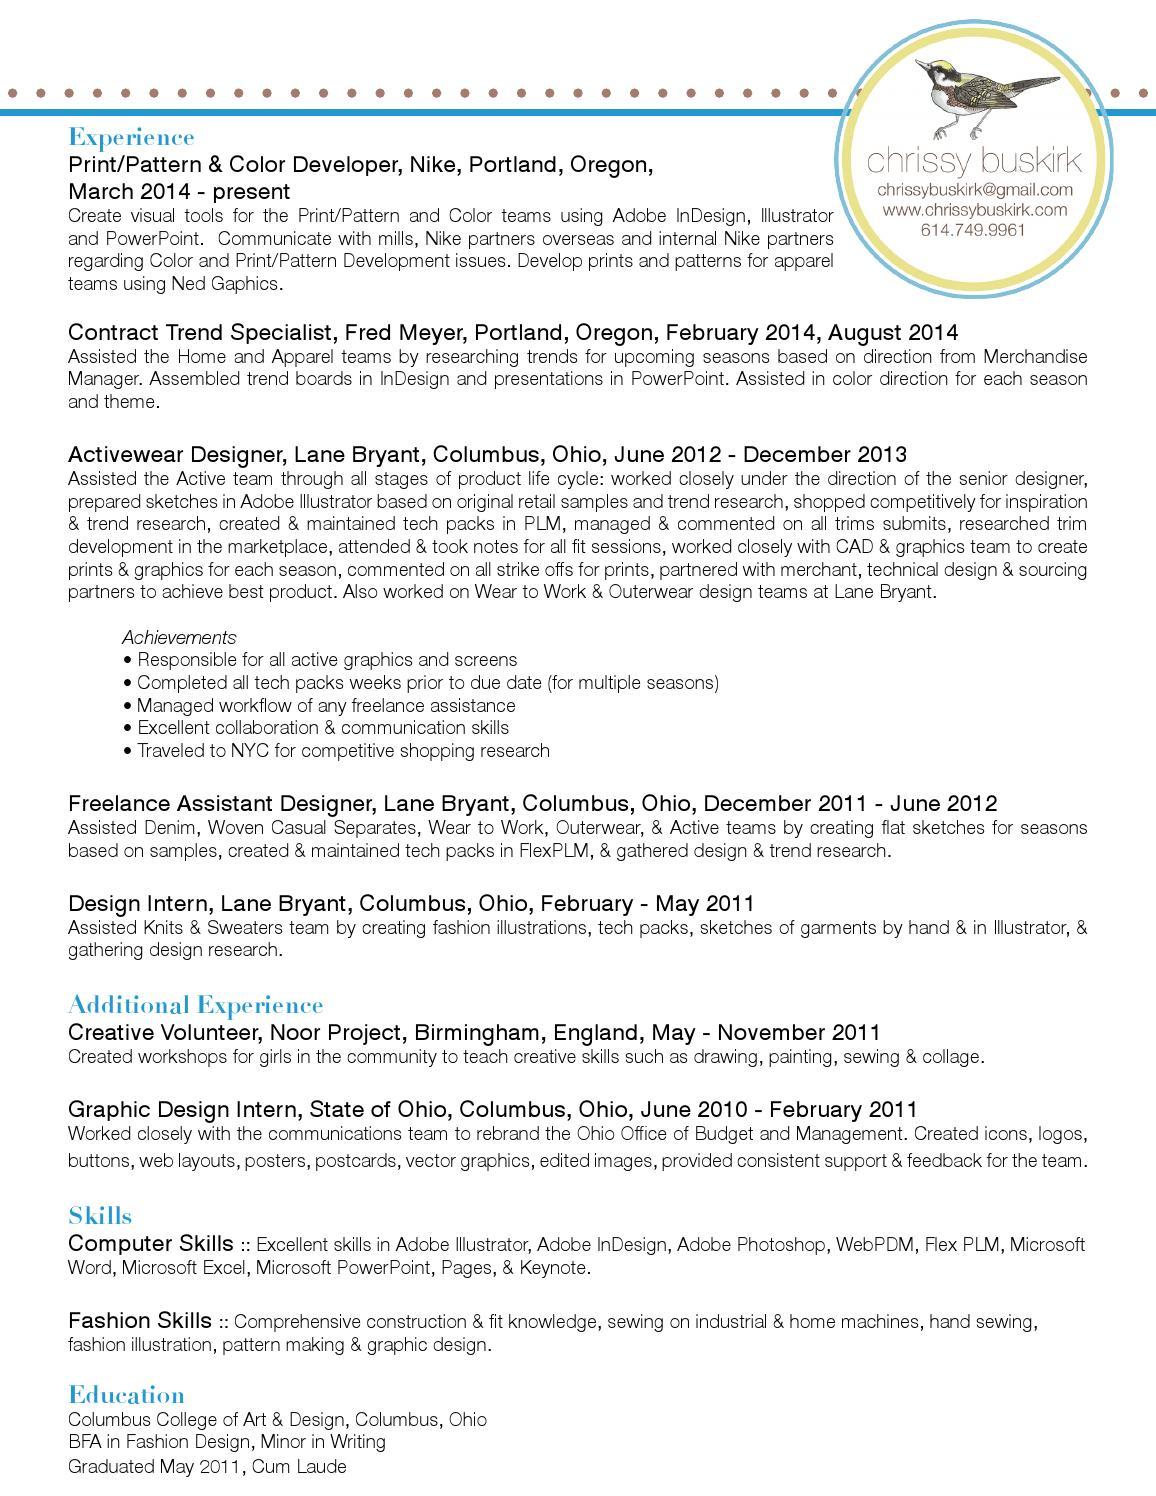 Chrissy Buskirk Resume By Chrissy B Issuu